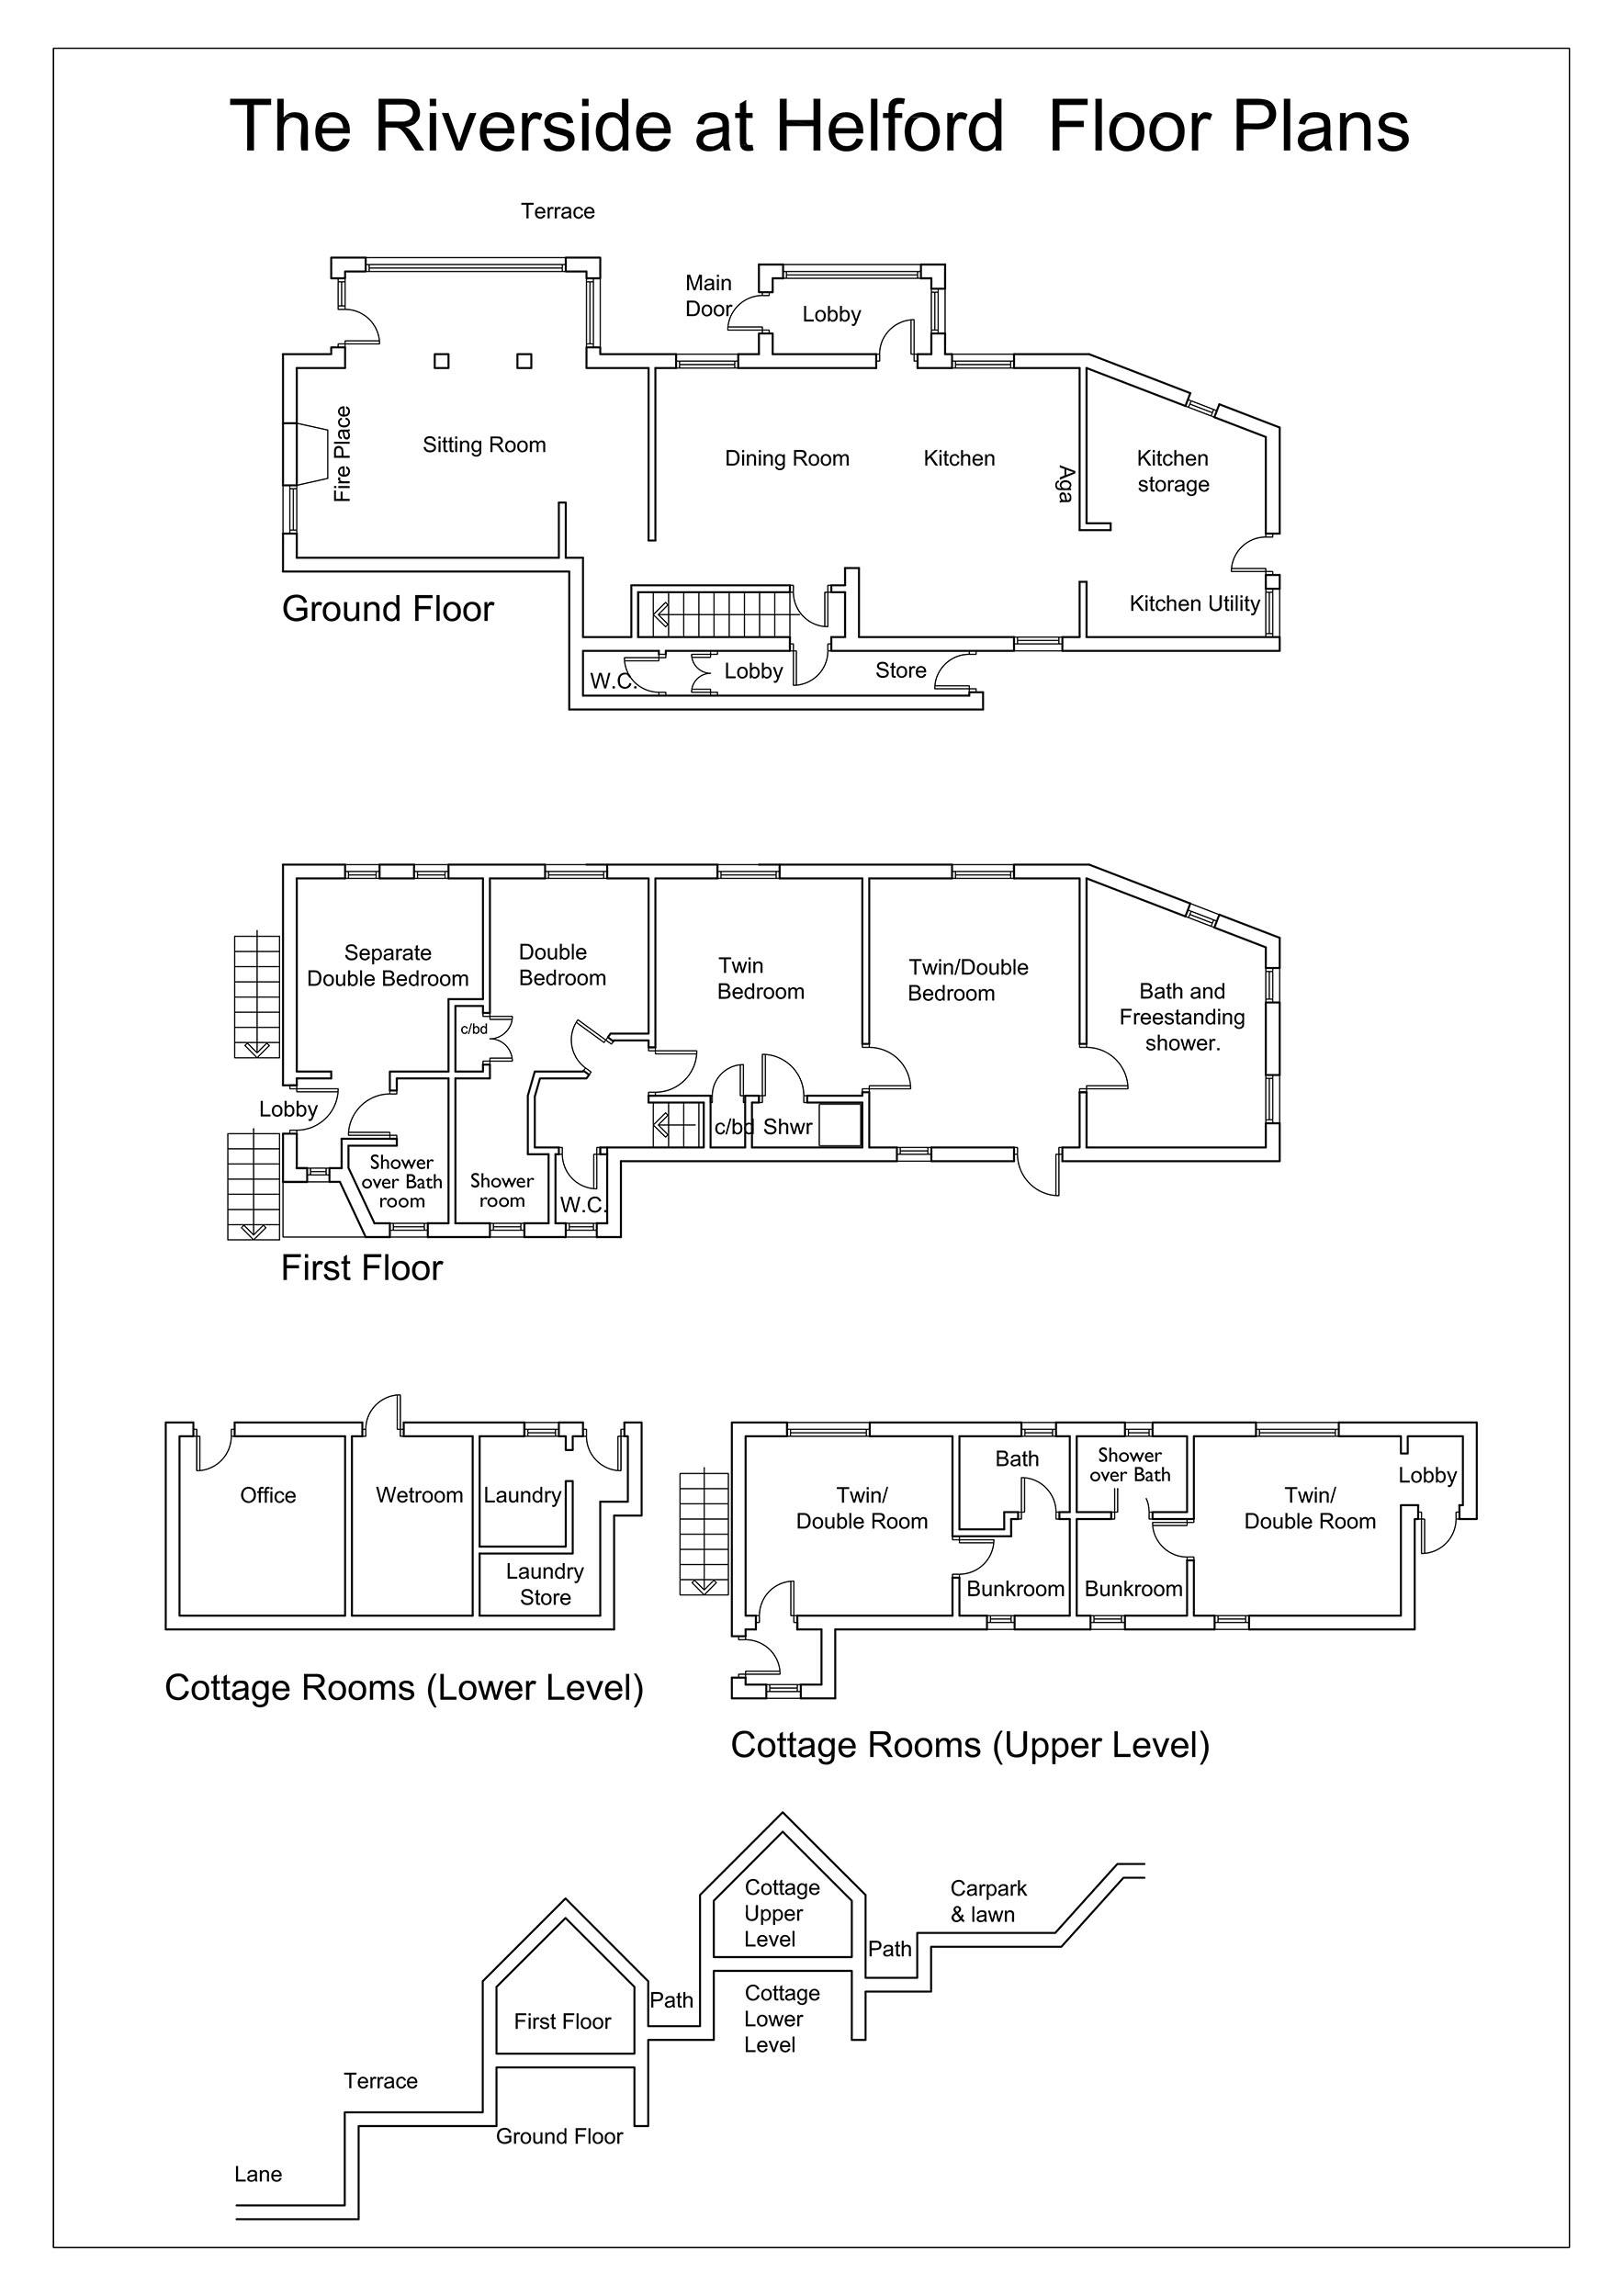 Riverside Room Plan 2019.jpg